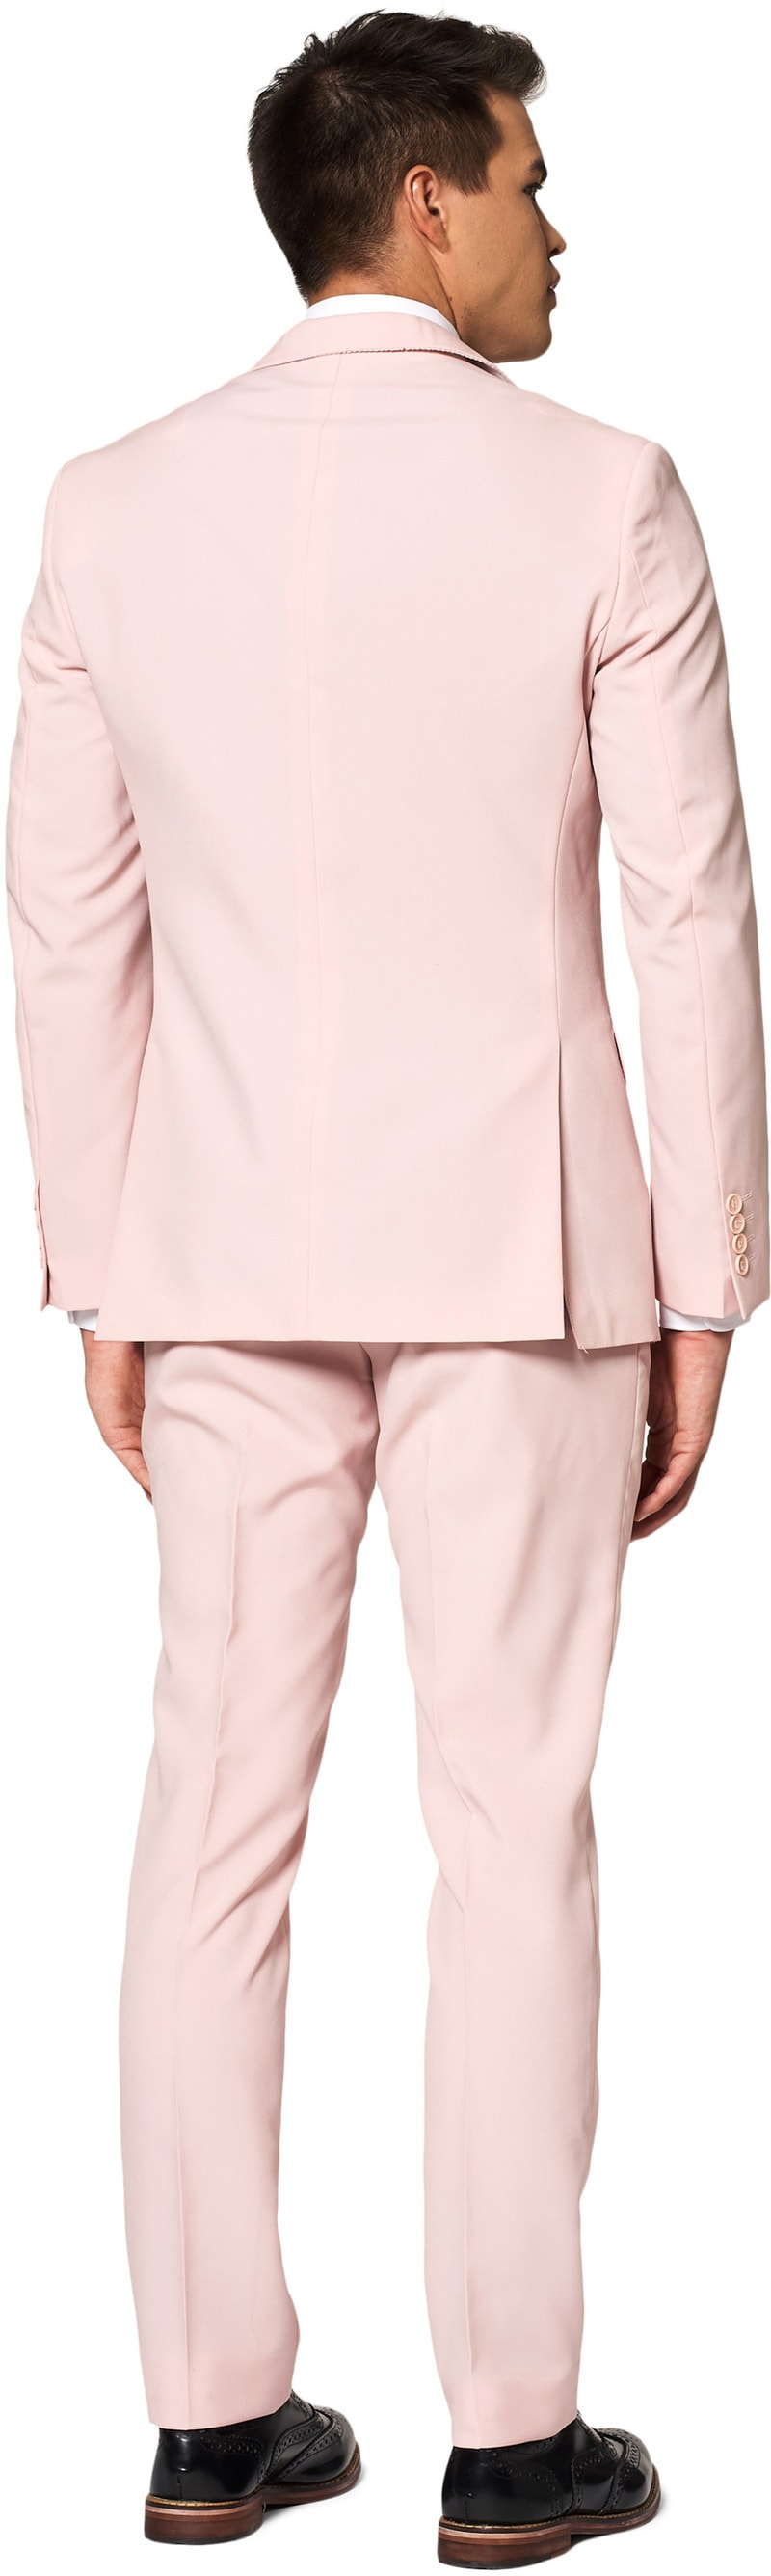 OppoSuits Lush Blush Suit photo 1